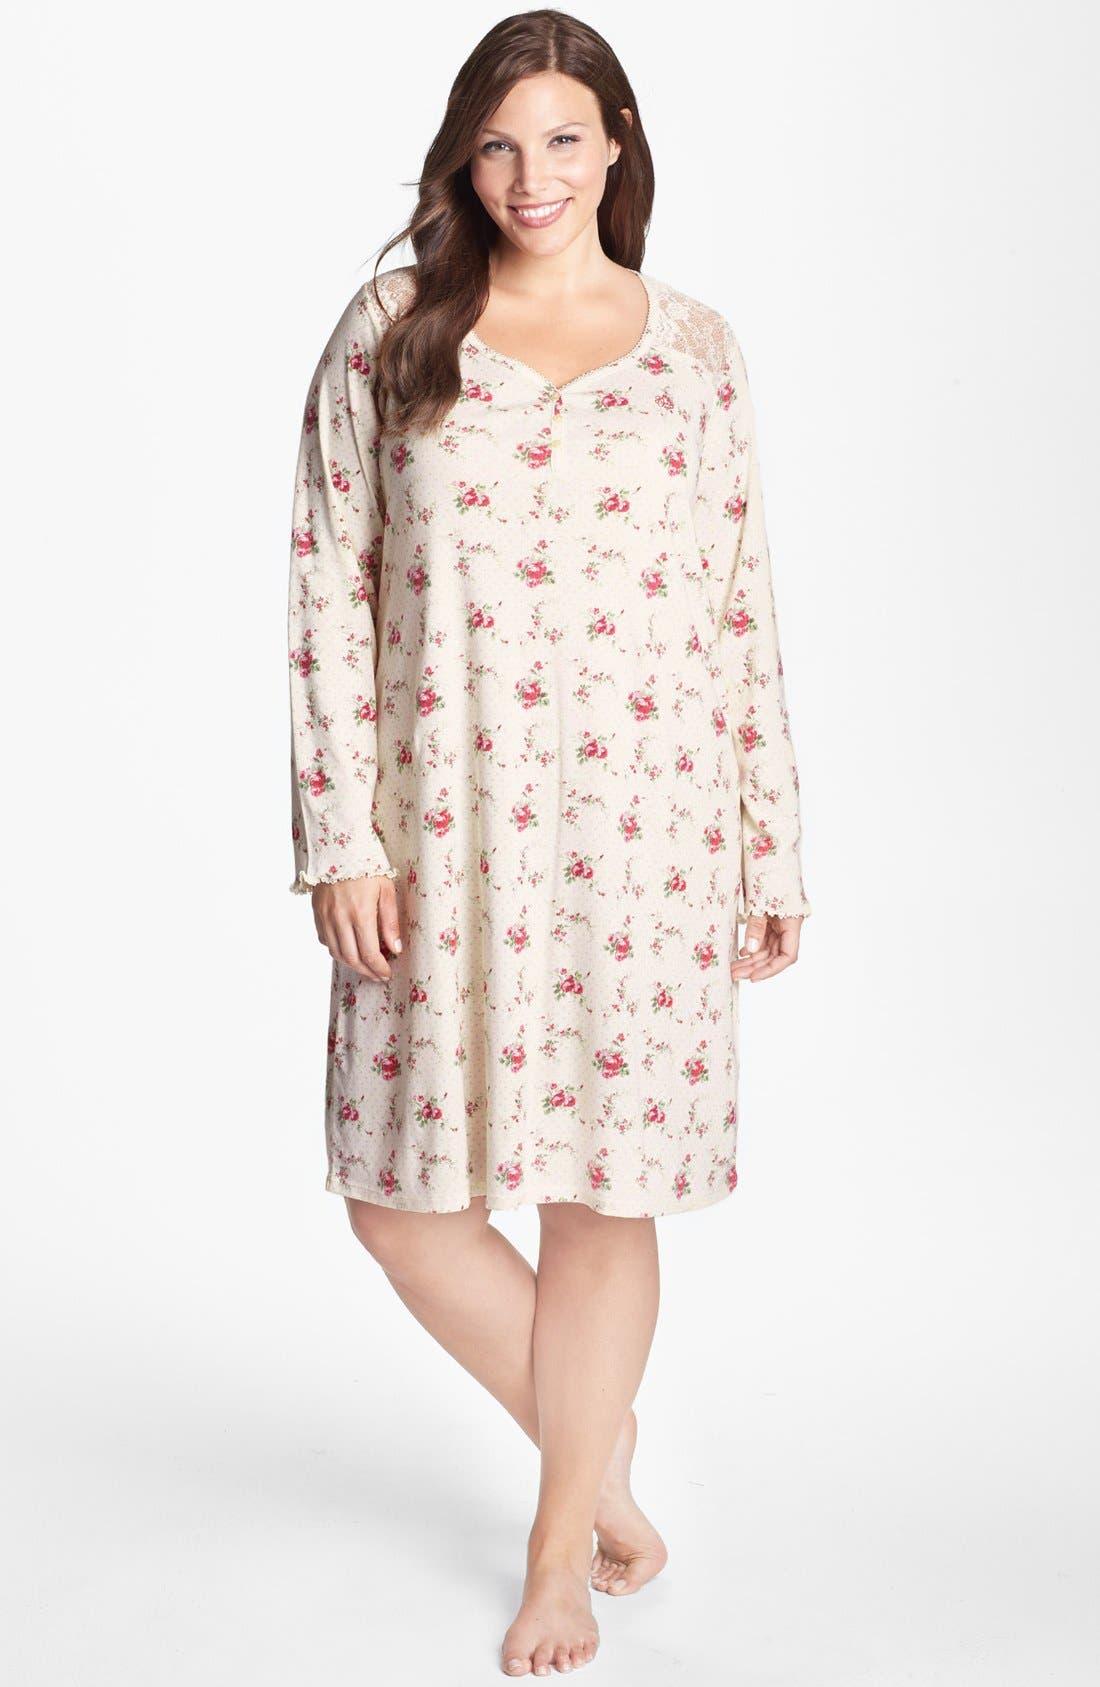 Alternate Image 1 Selected - Lauren Ralph Lauren Lace Trim Sleep Shirt (Plus Size)